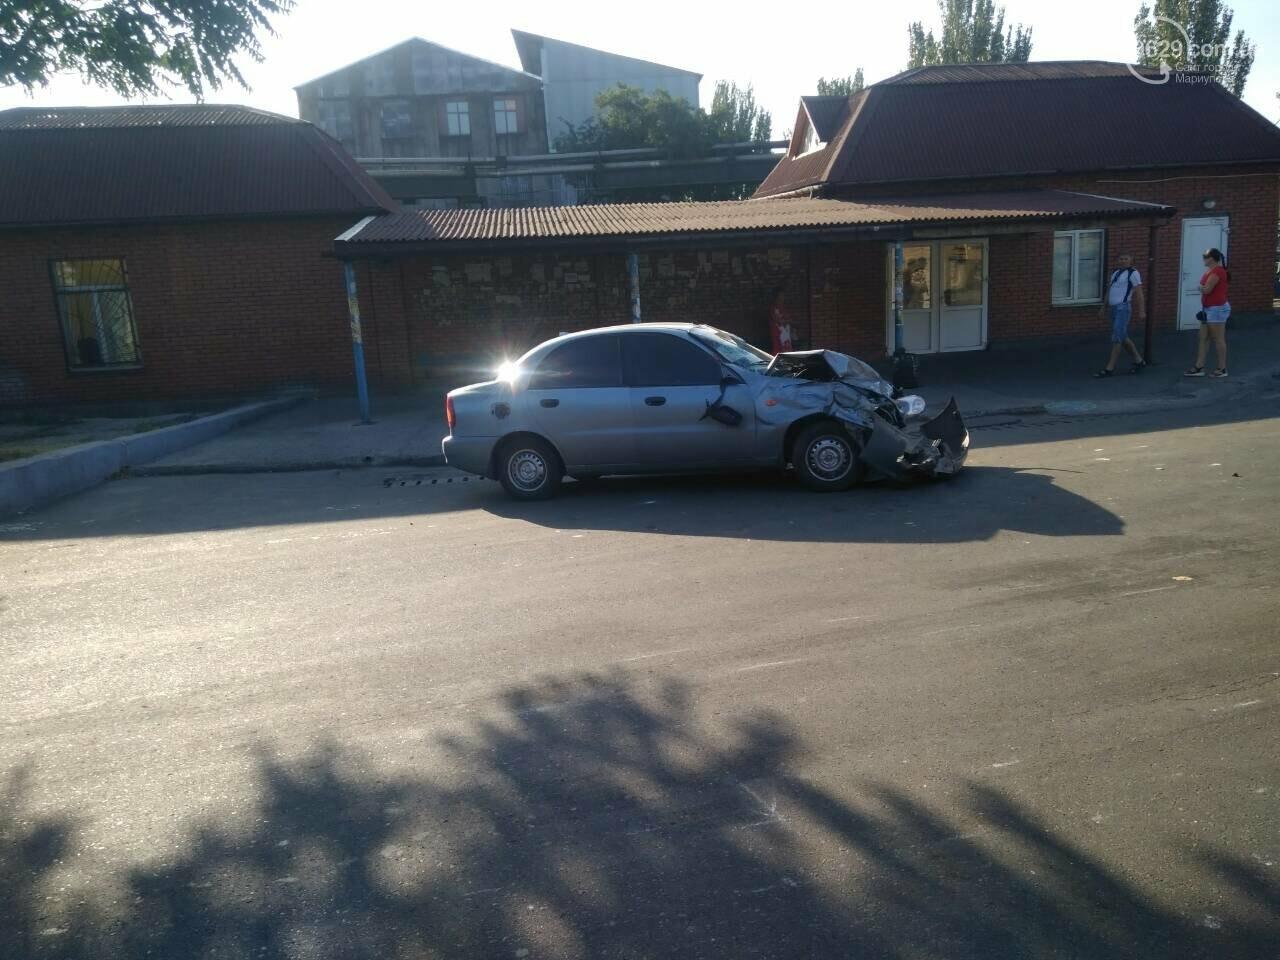 В Мариуполе грузовик протаранил легковушку, - ФОТО - 0629 com ua